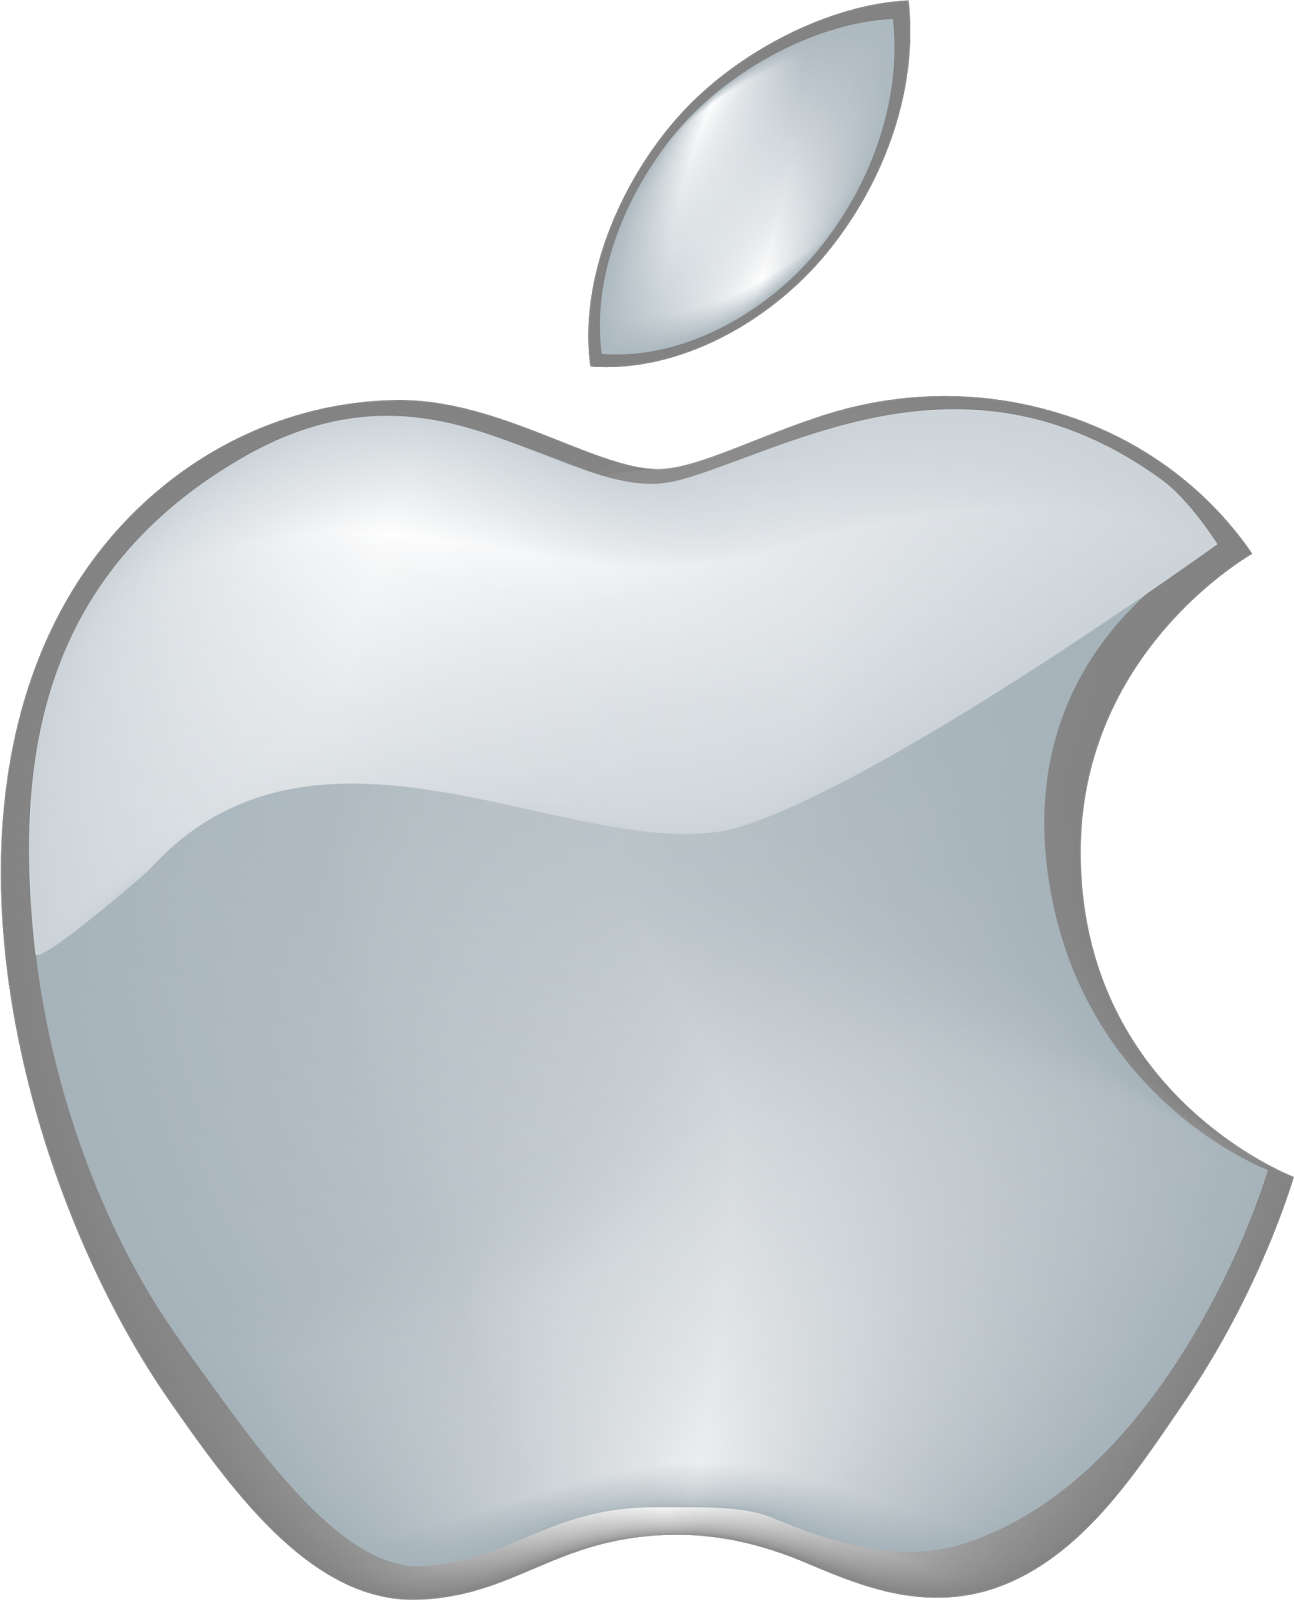 Classic Apple Logo Bing Images Apple Logo Image For Apple Apple